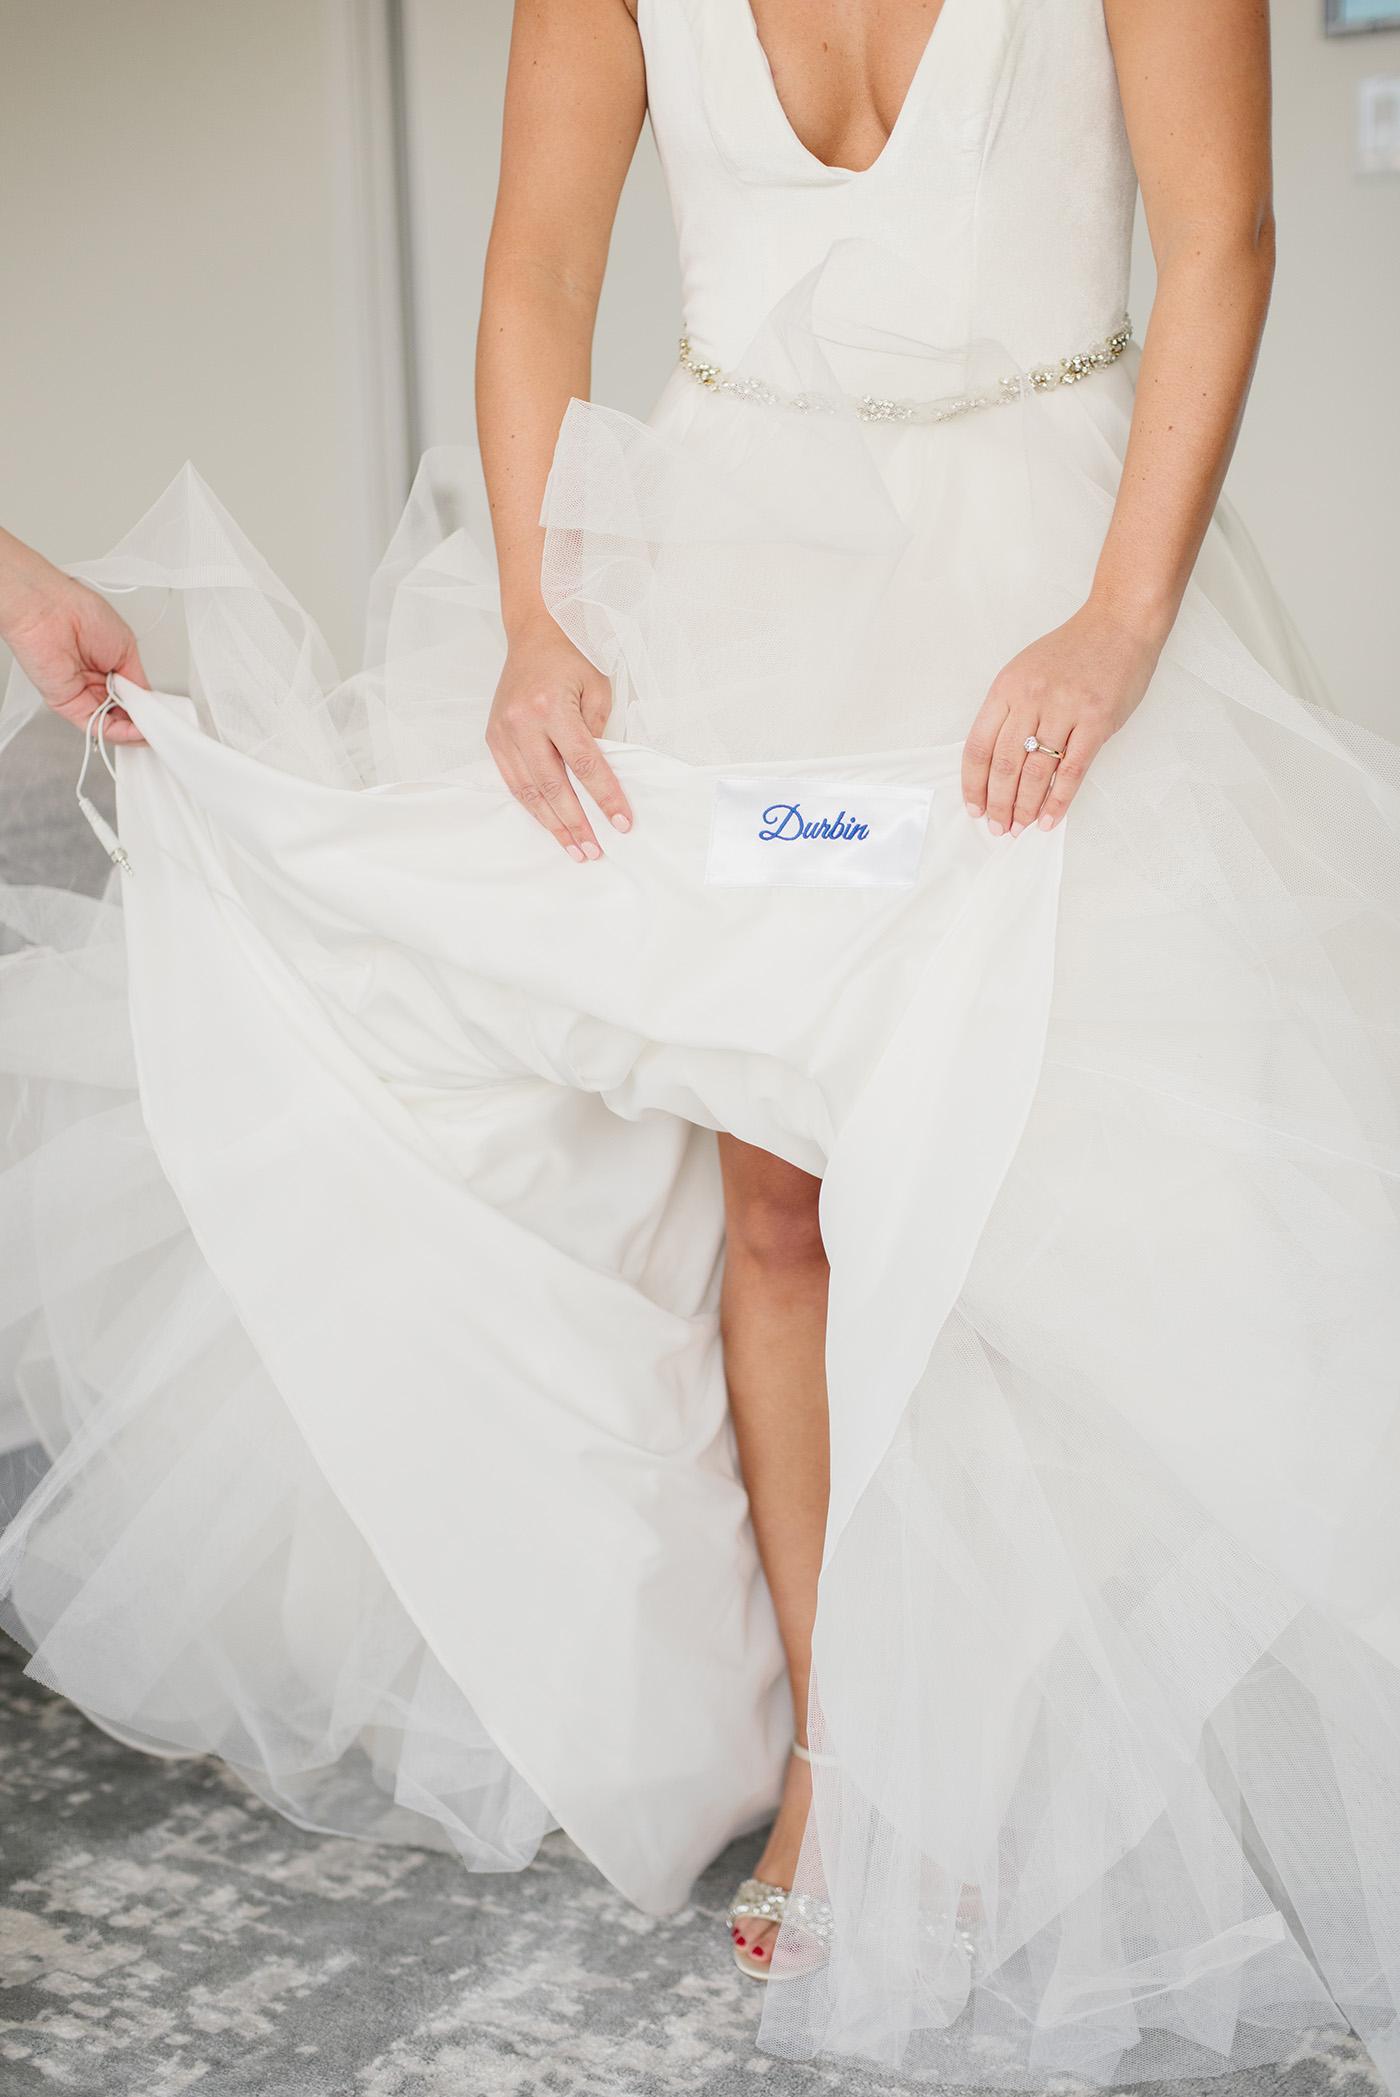 Dallas Wedding Planner - Winter Wedding at The Room on Main - Allday Events - 52.jpg